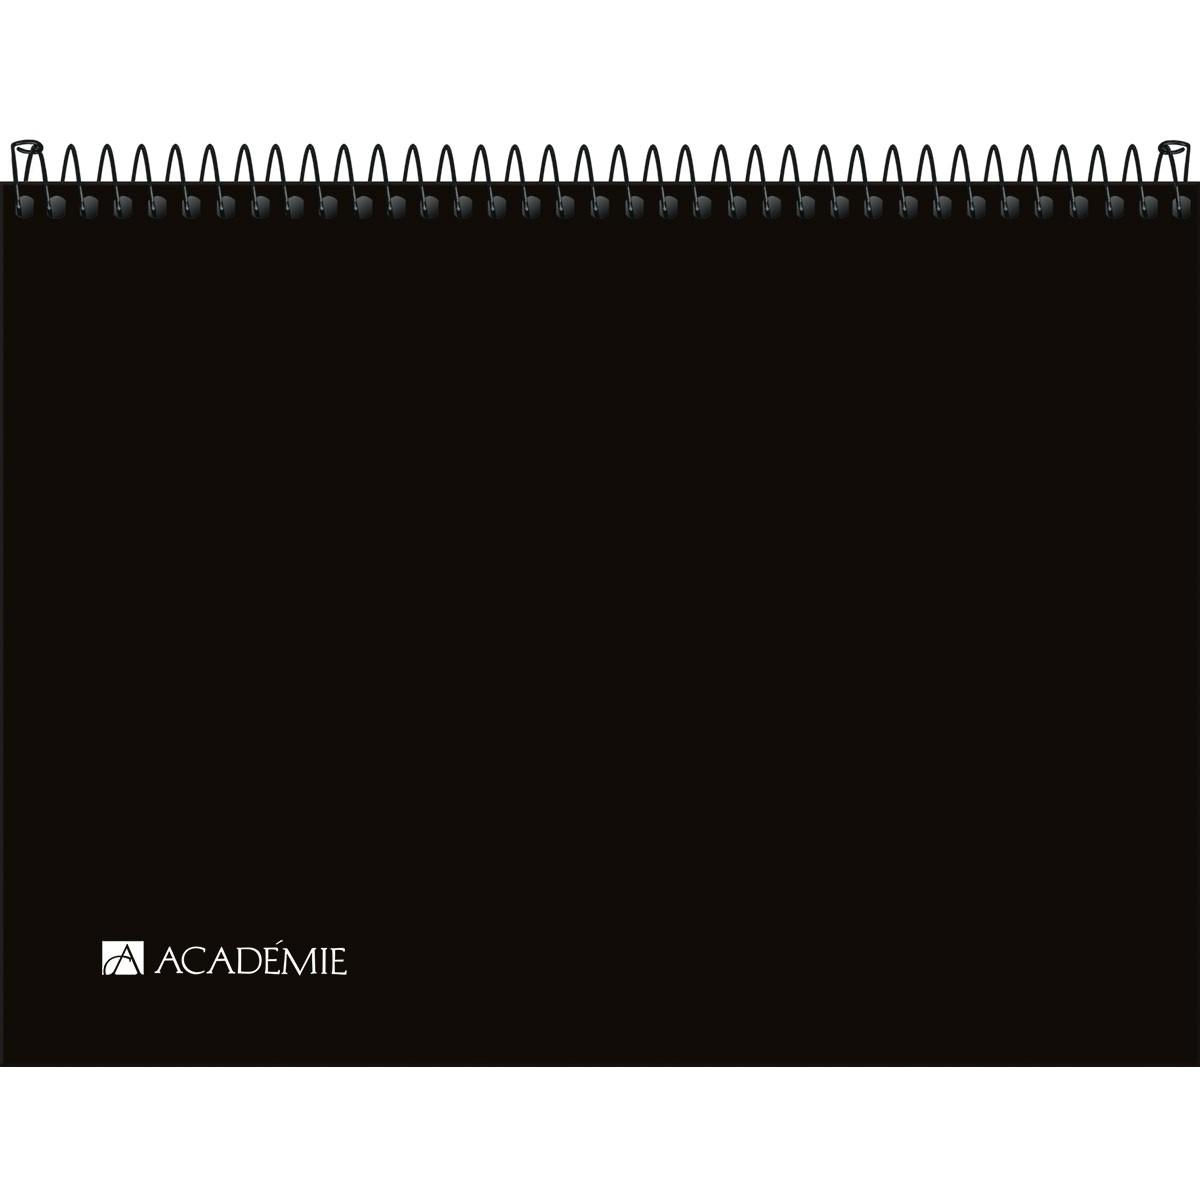 Caderno Sketchbook Espiral Capa Plástica A4 Académie Sense 150g 50 Folhas